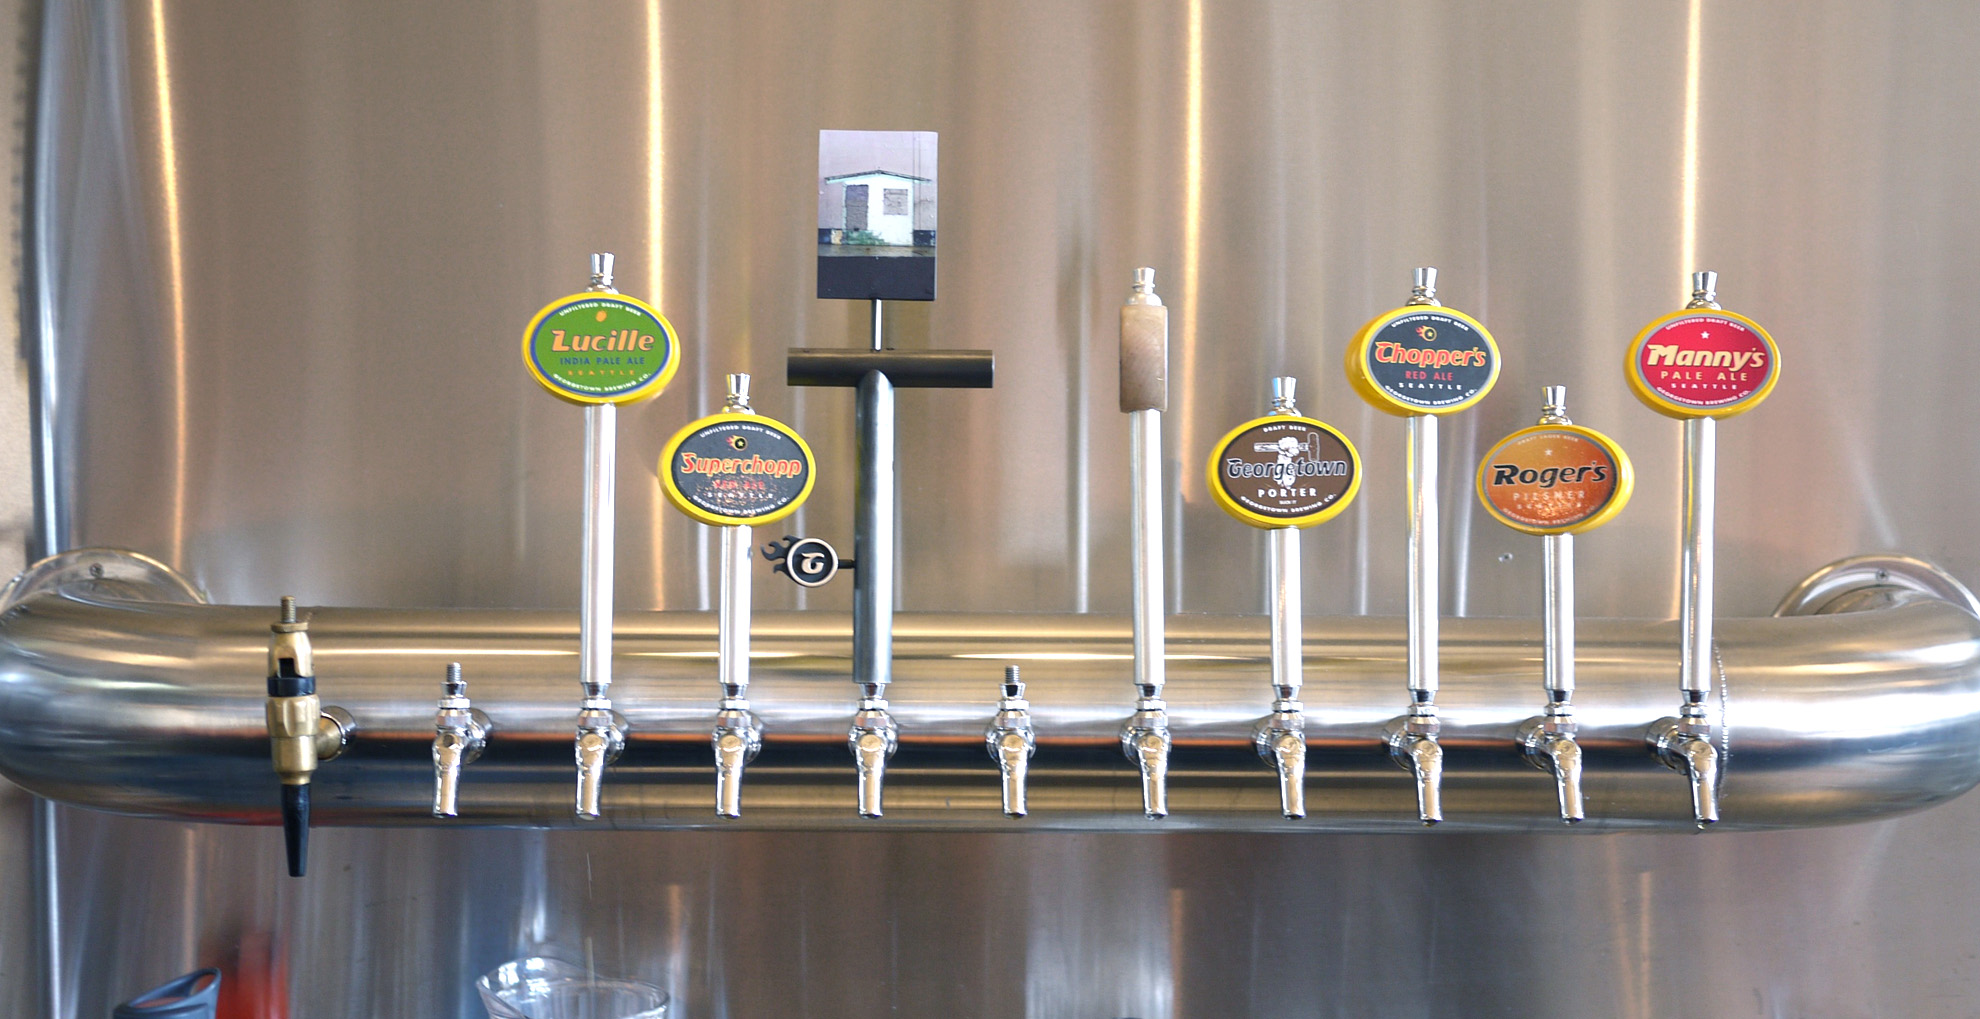 G-town tap 2.jpg